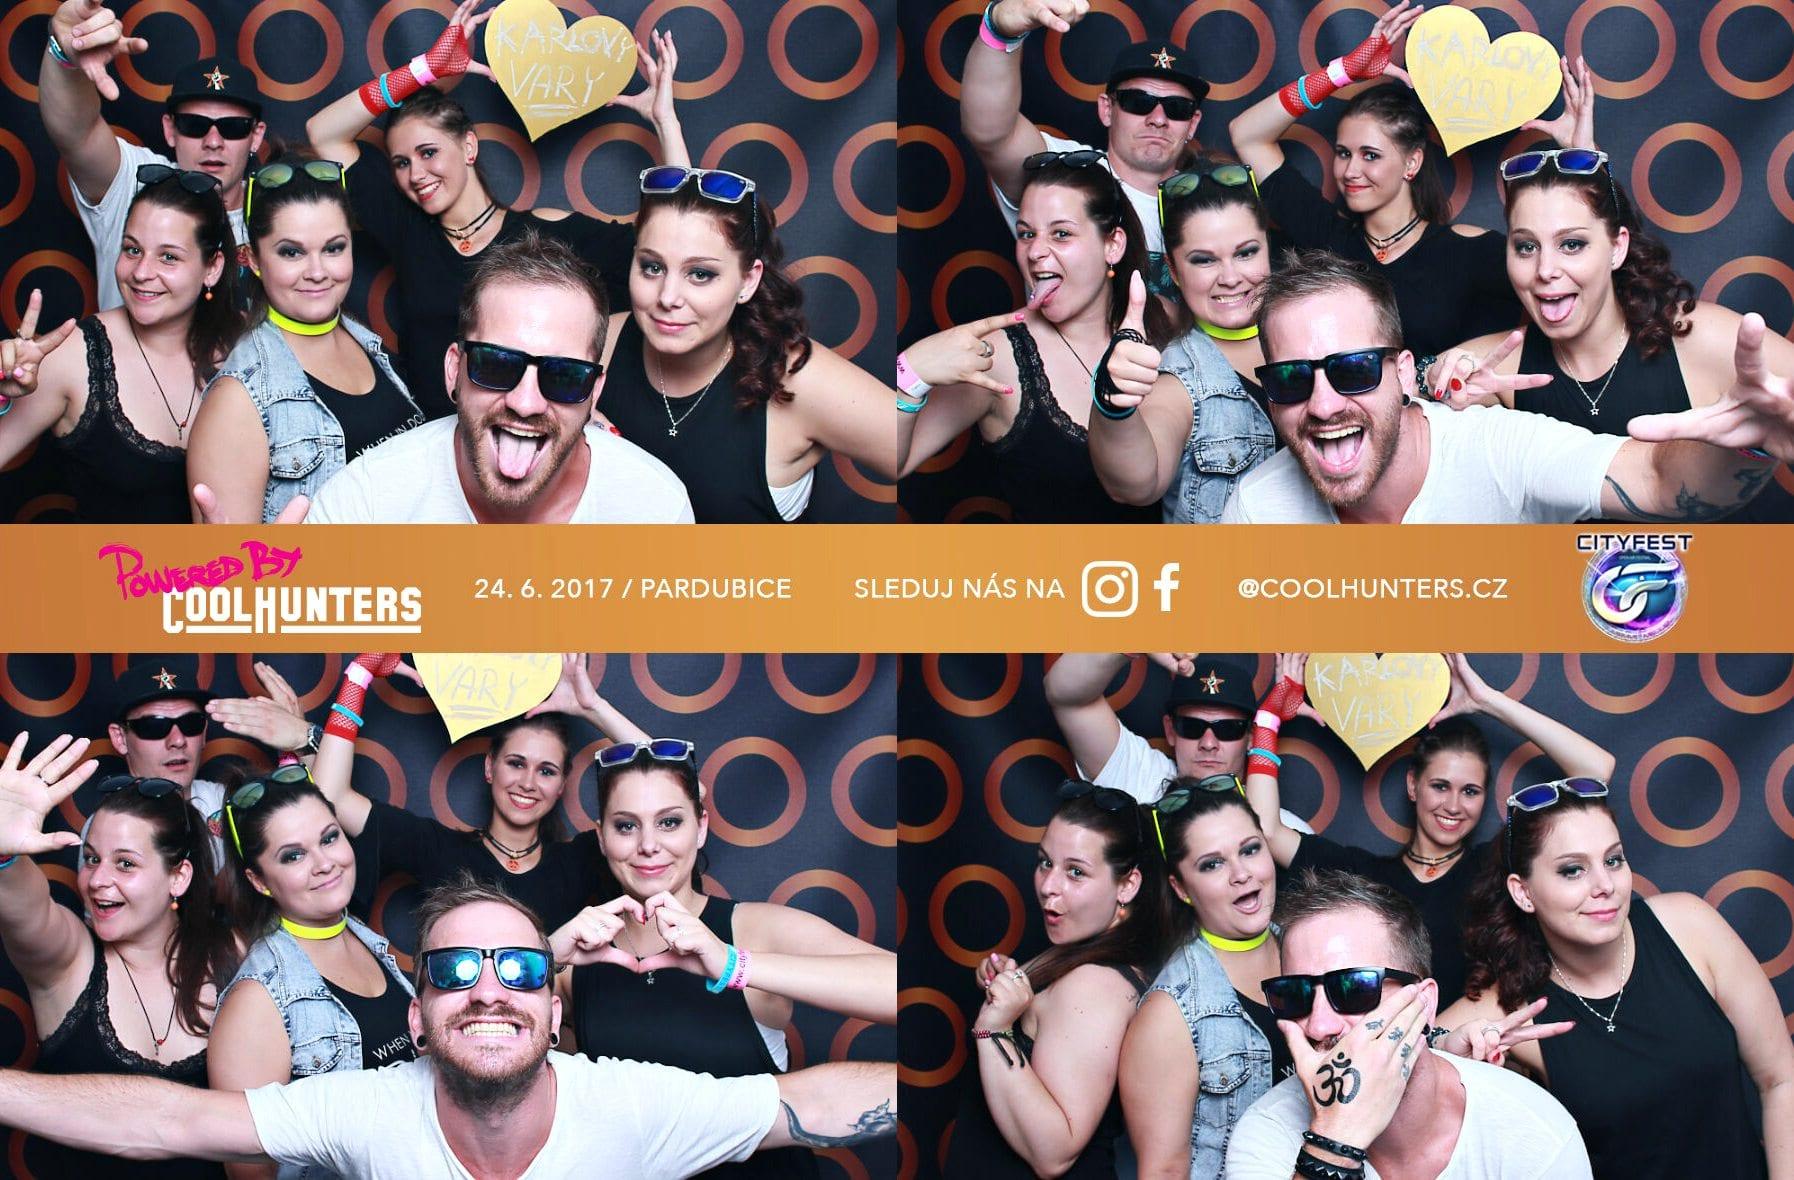 fotokoutek-coolhunters-24-6-2017-274108